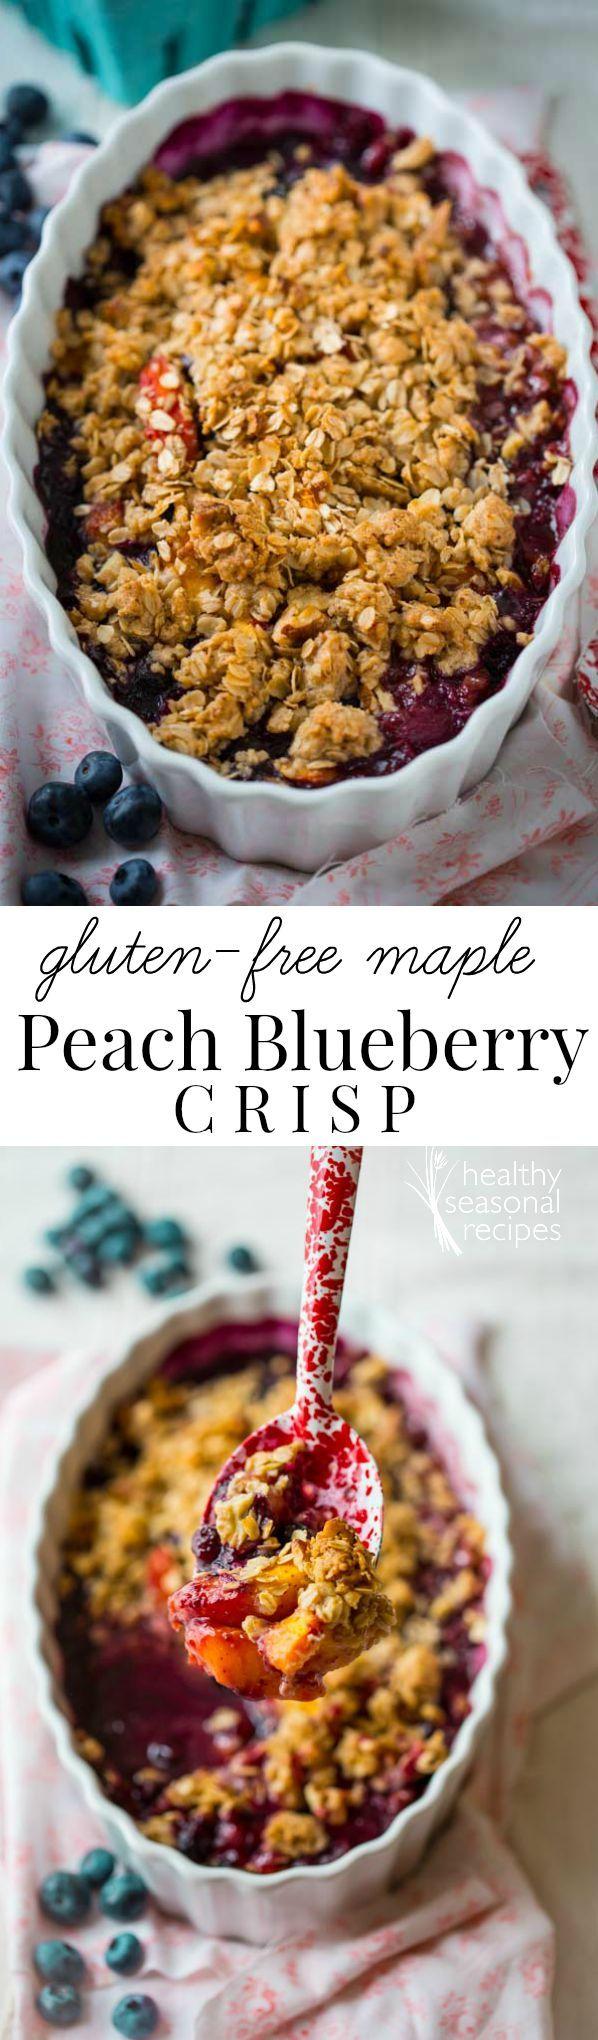 gluten free maple peach blueberry crisp - Healthy Seasonal Recipes